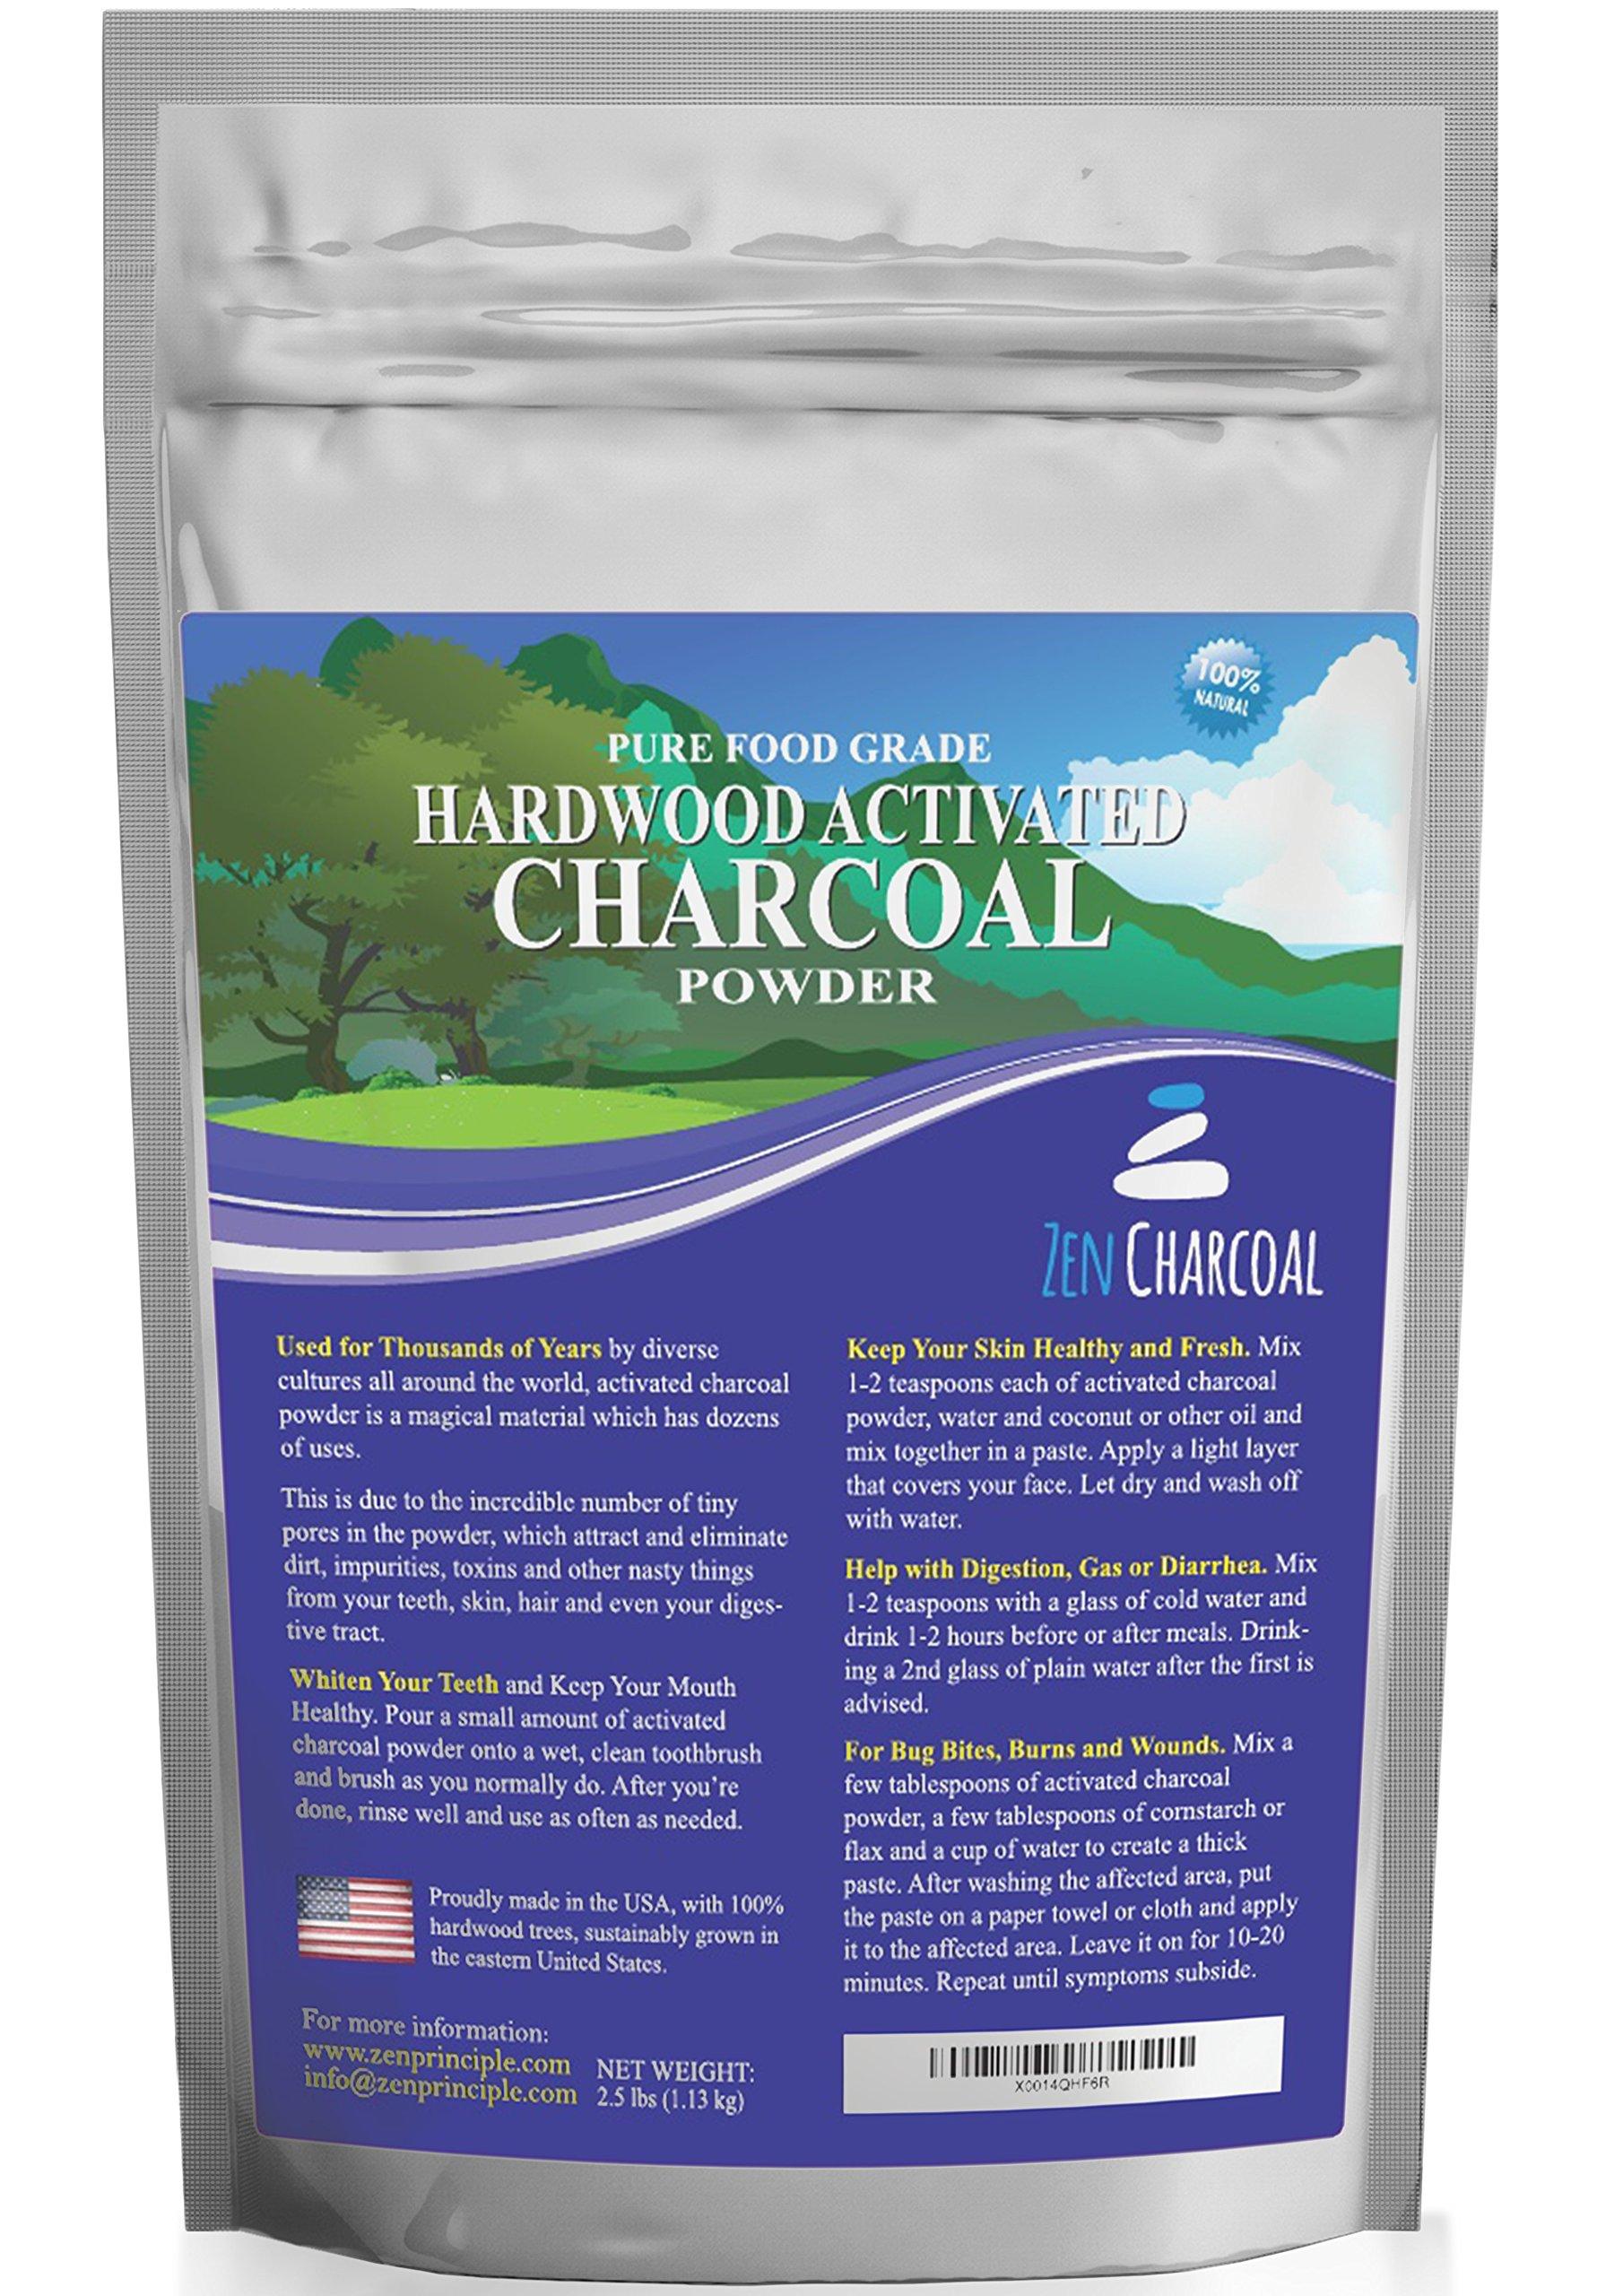 Zen Charcoal Activated Charcoal Powder (40 Ounces)